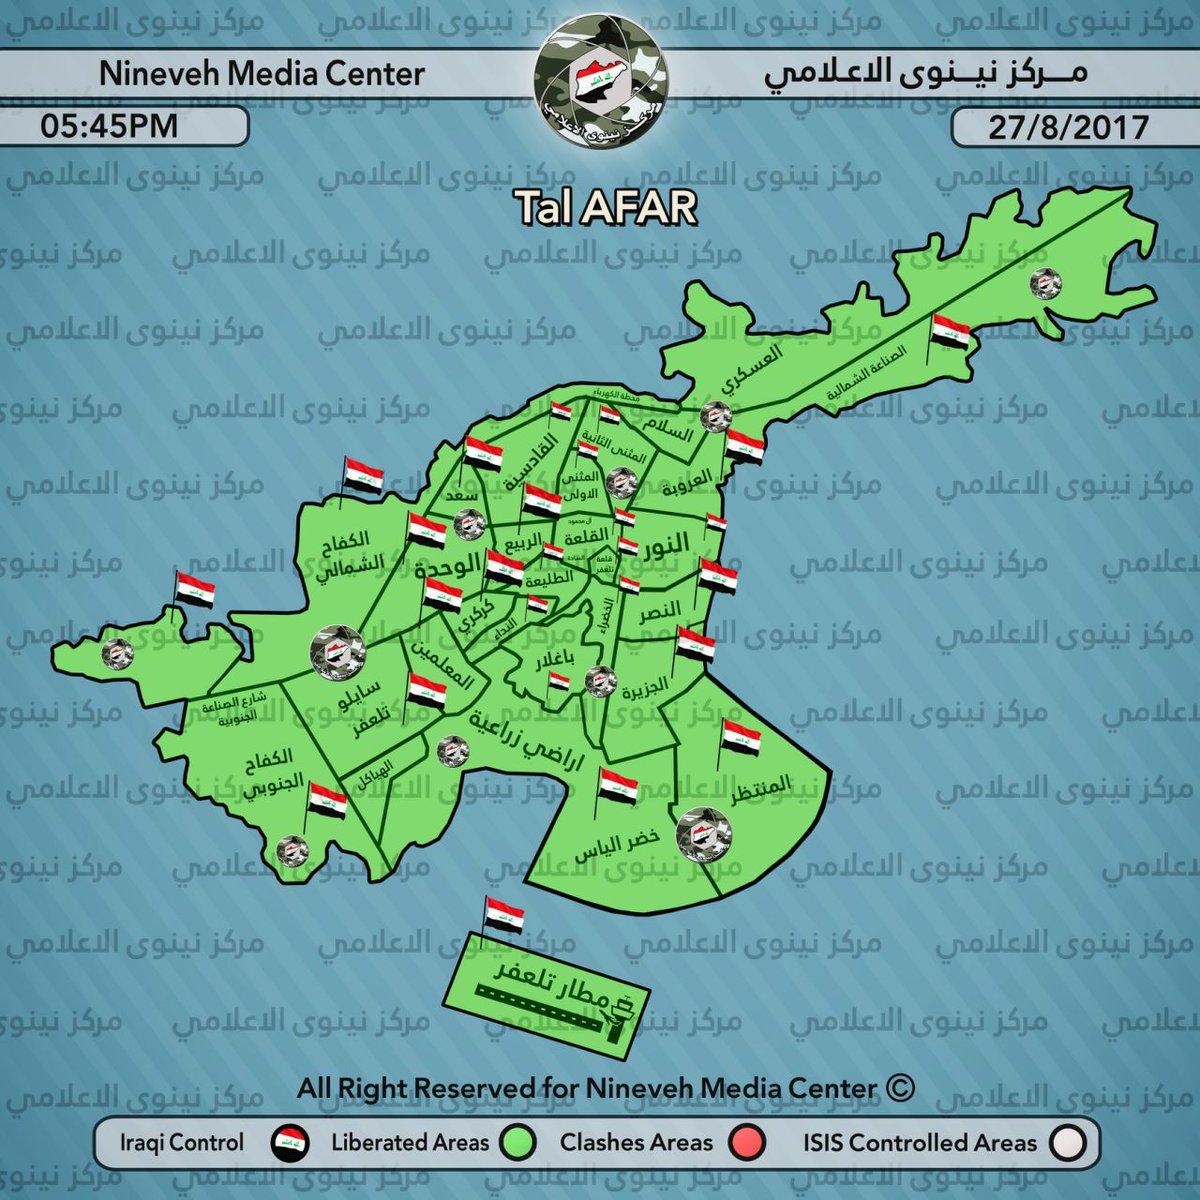 معركة الموصل - صفحة 15 DIPz_JlXkAE_aUA